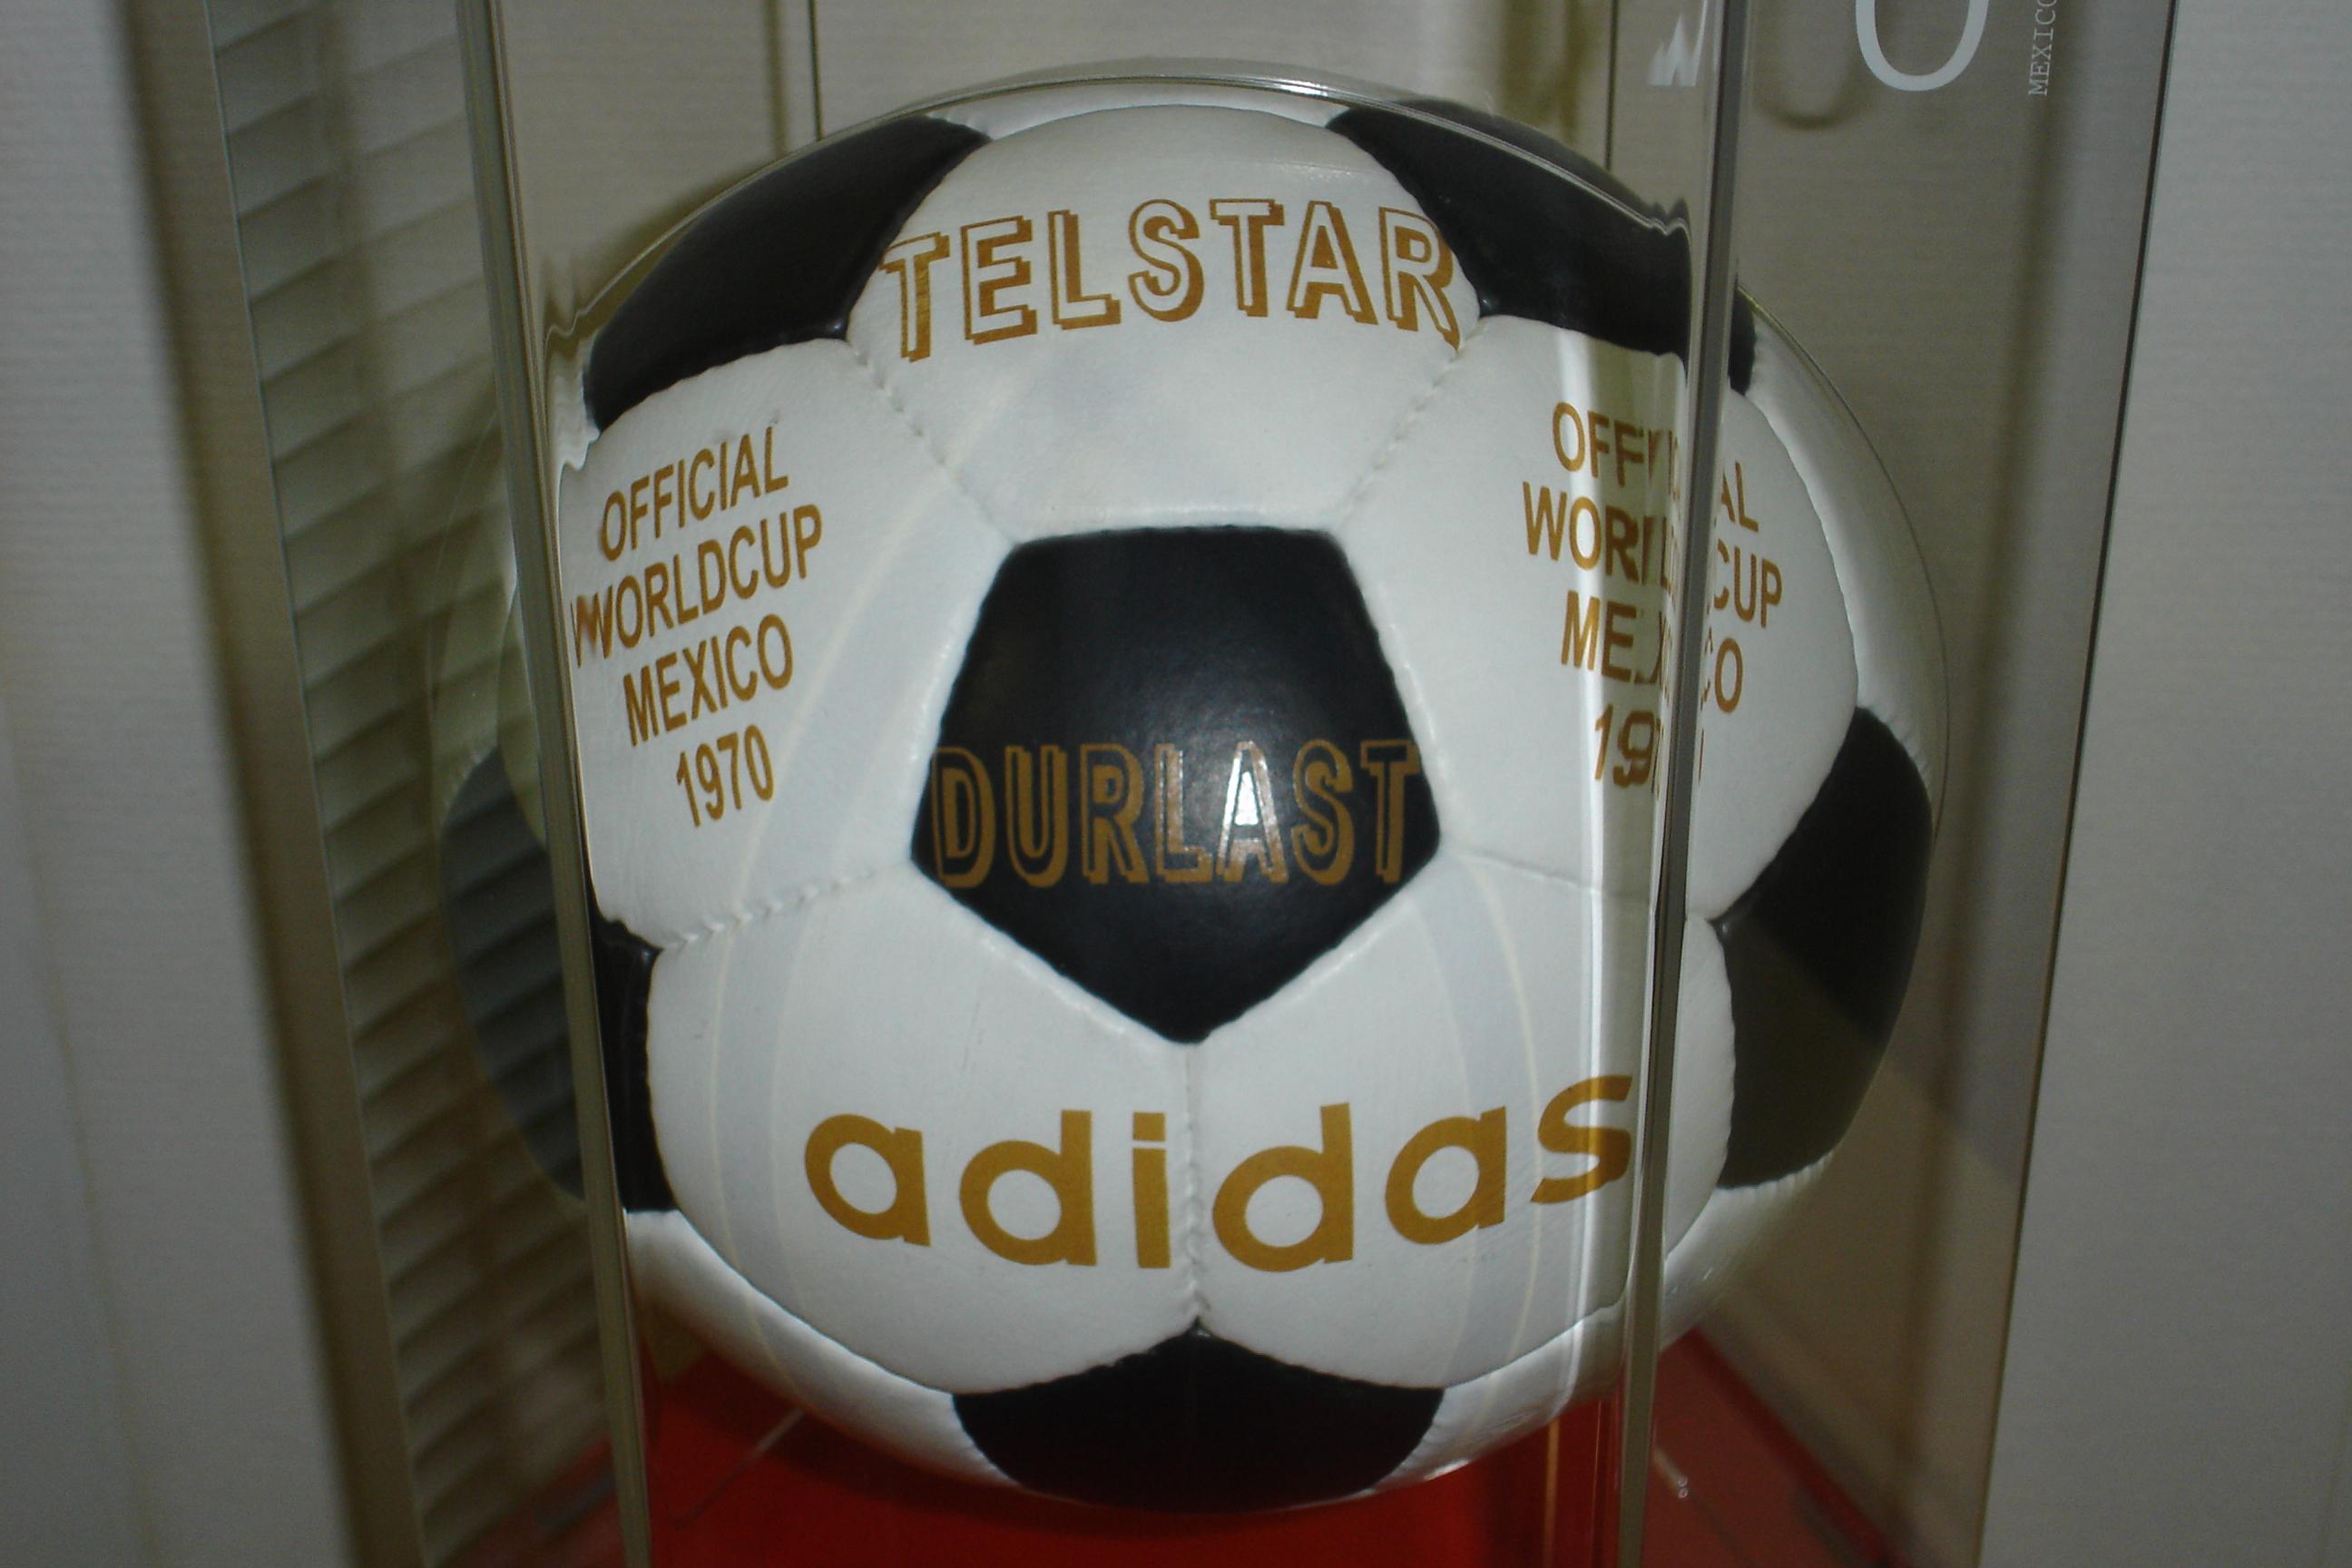 Lista de bolas oficiais da Copa do Mundo FIFA - Wikiwand 78f3977a0fa26